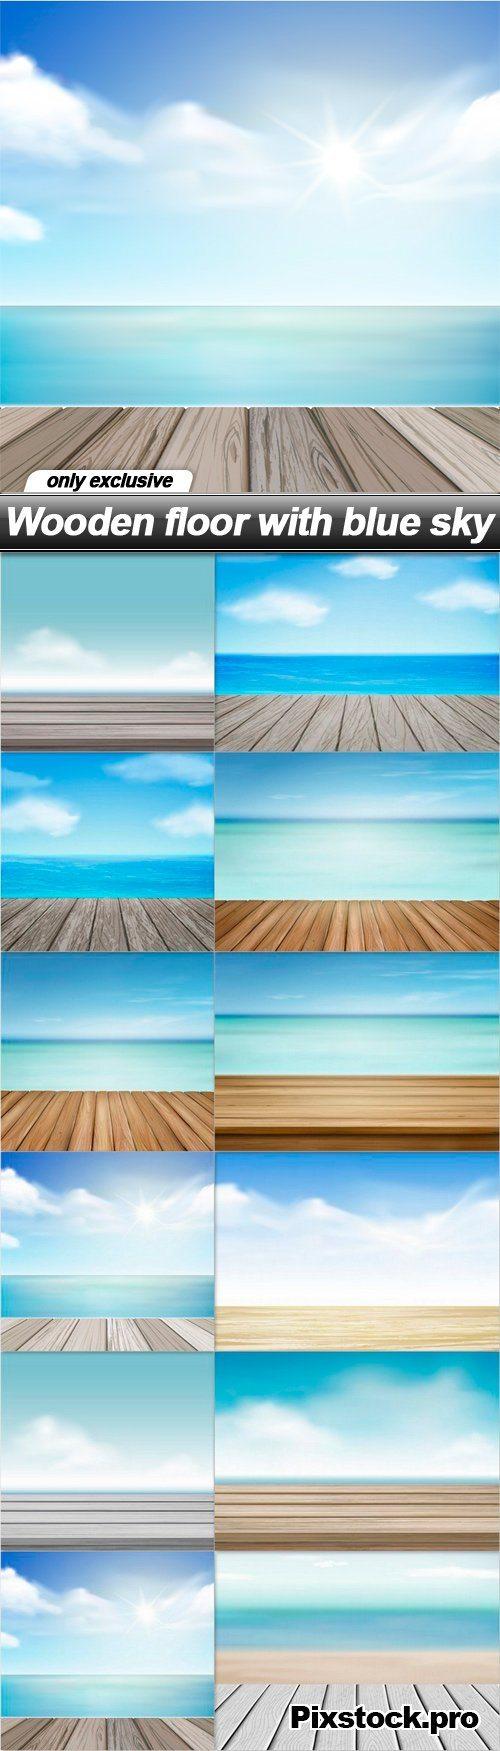 Wooden floor with blue sky – 12 EPS